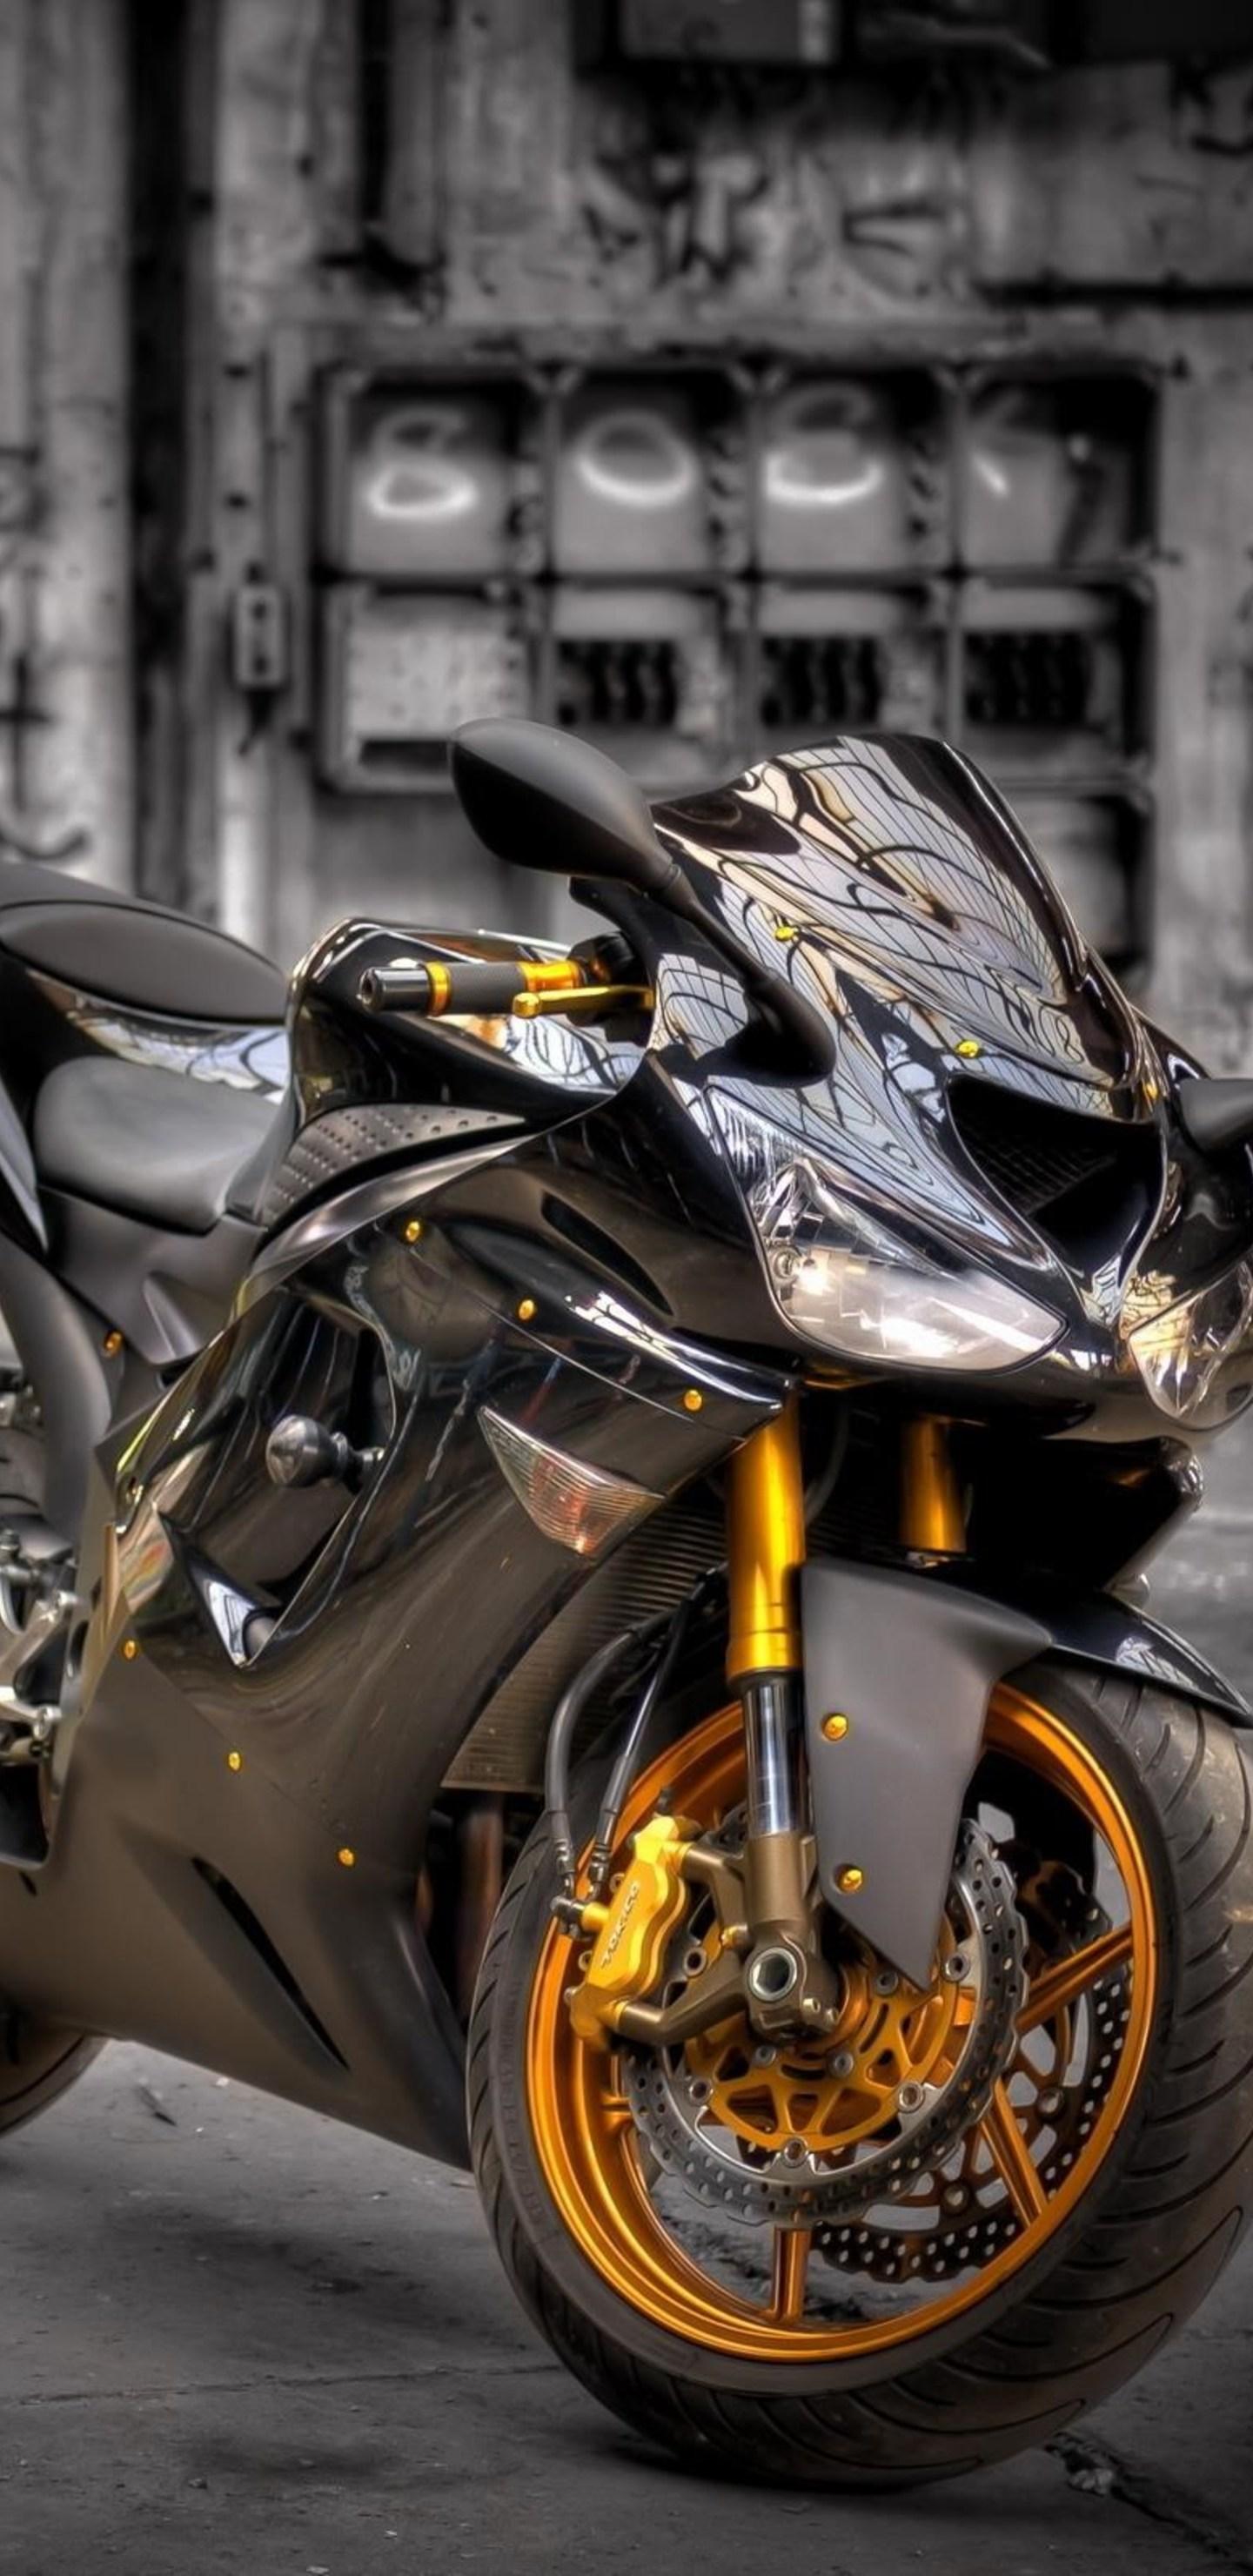 Kawasaki Zx6r Kawasaki Ninja Wallpaper Iphone 1423667 Hd Wallpaper Backgrounds Download